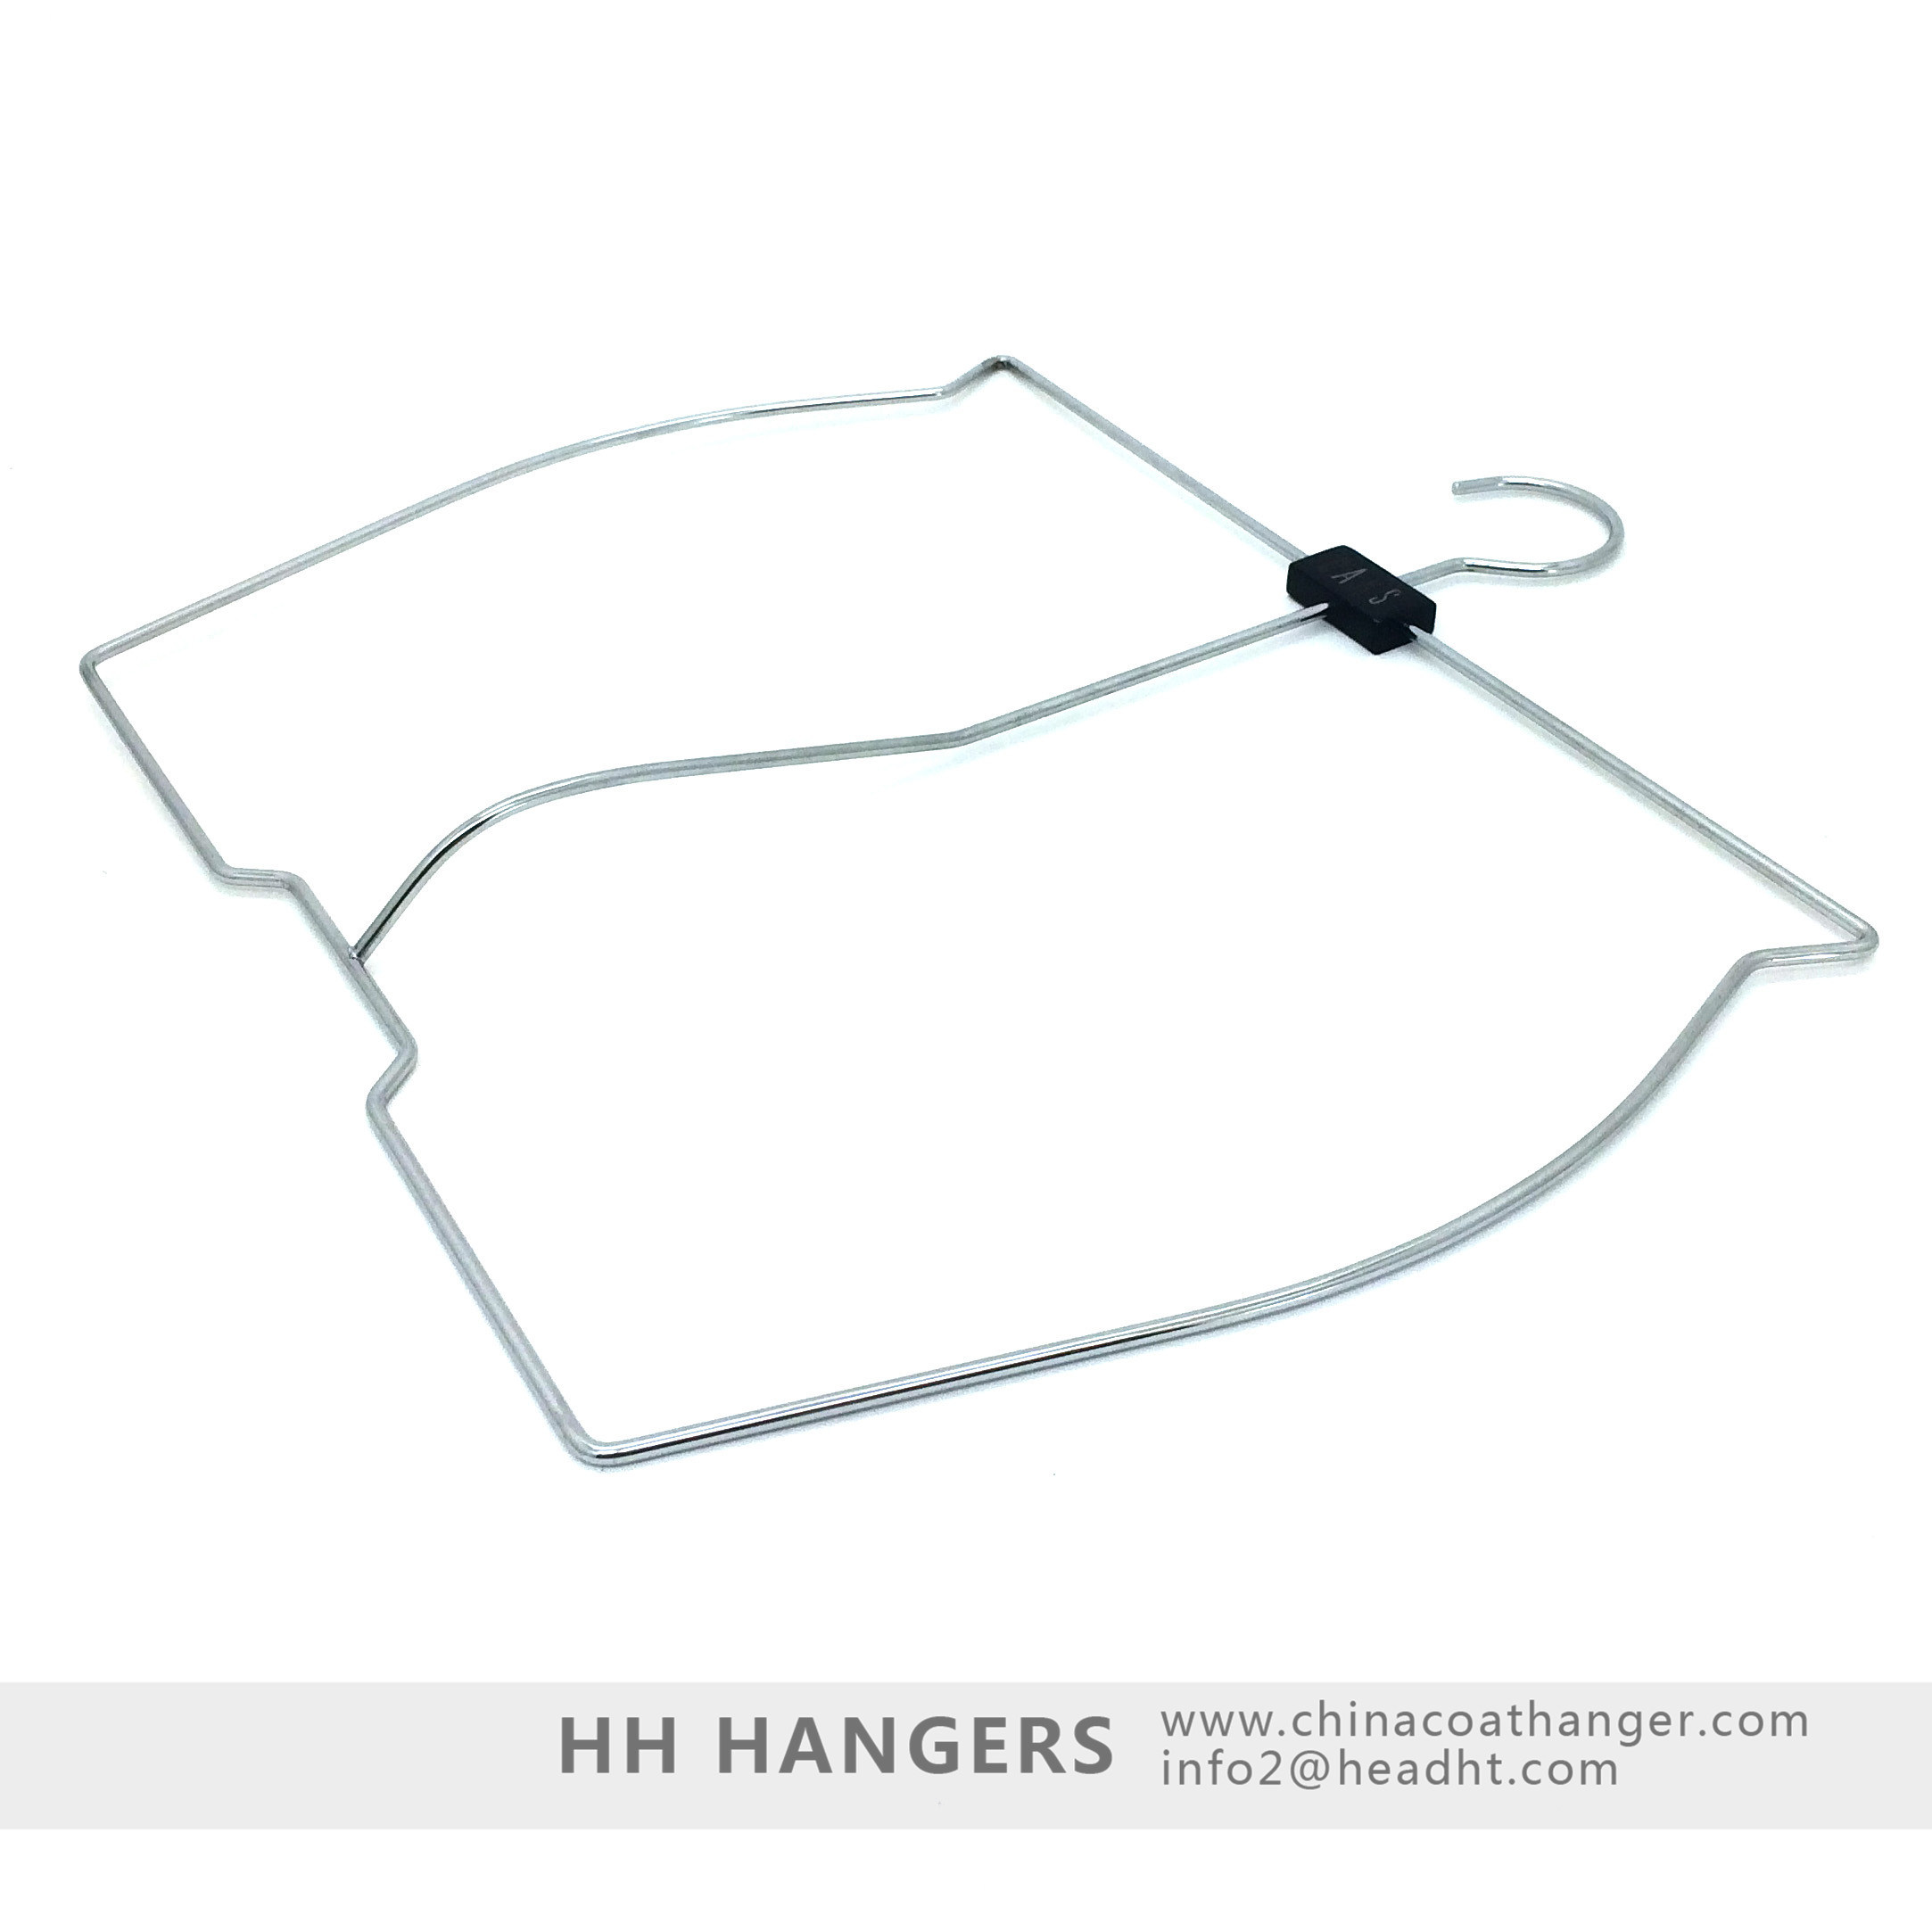 Logo Branded Men′s Shorts Swimming Wear Wet Suit Display Hanger, Metal Hanger